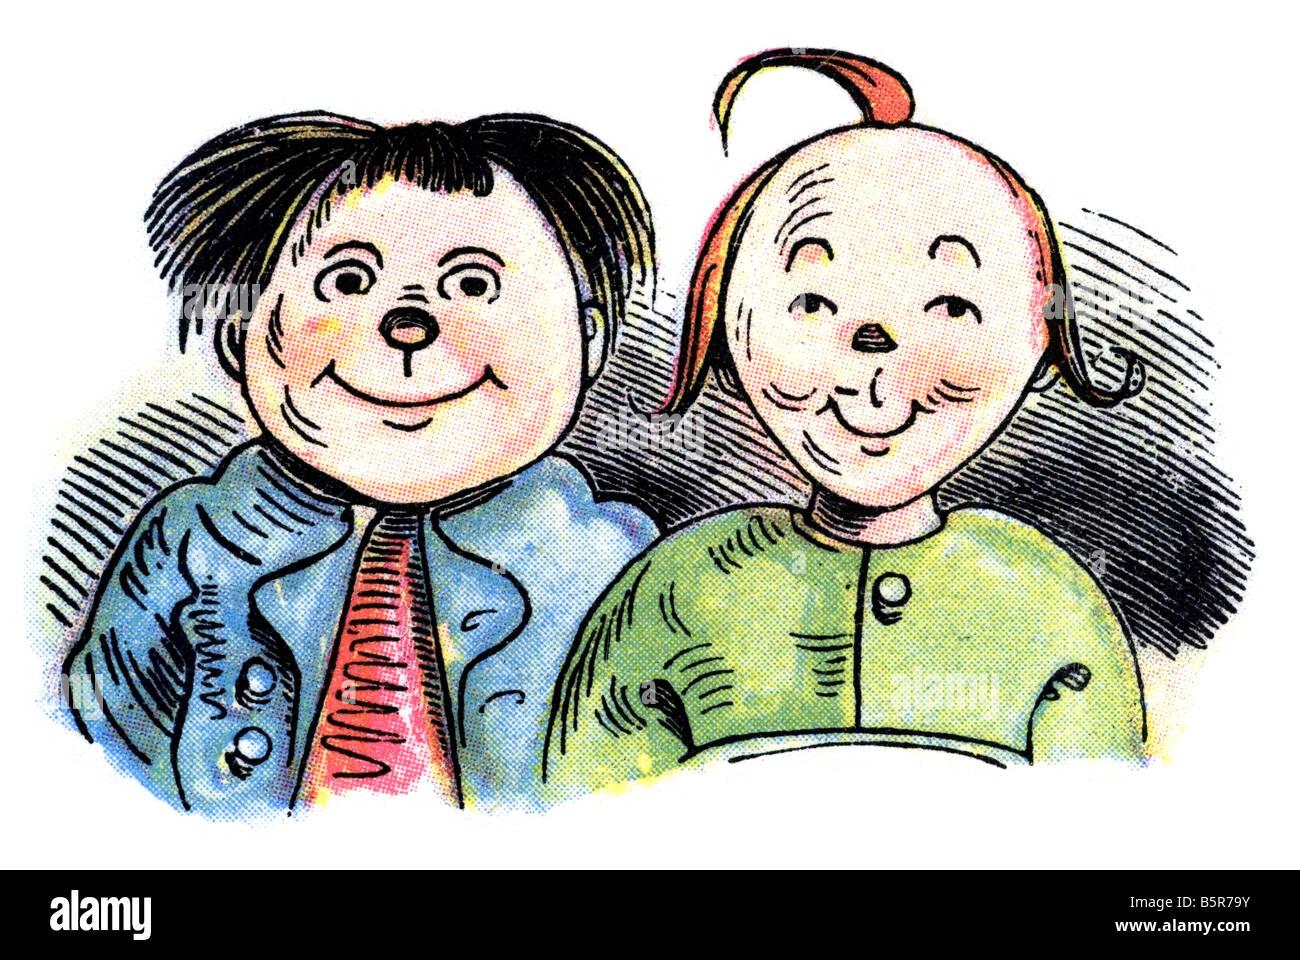 Max and Moritz A Story of Seven Boyish Pranks Heinrich Christian Wilhelm Busch 1865 - Stock Image